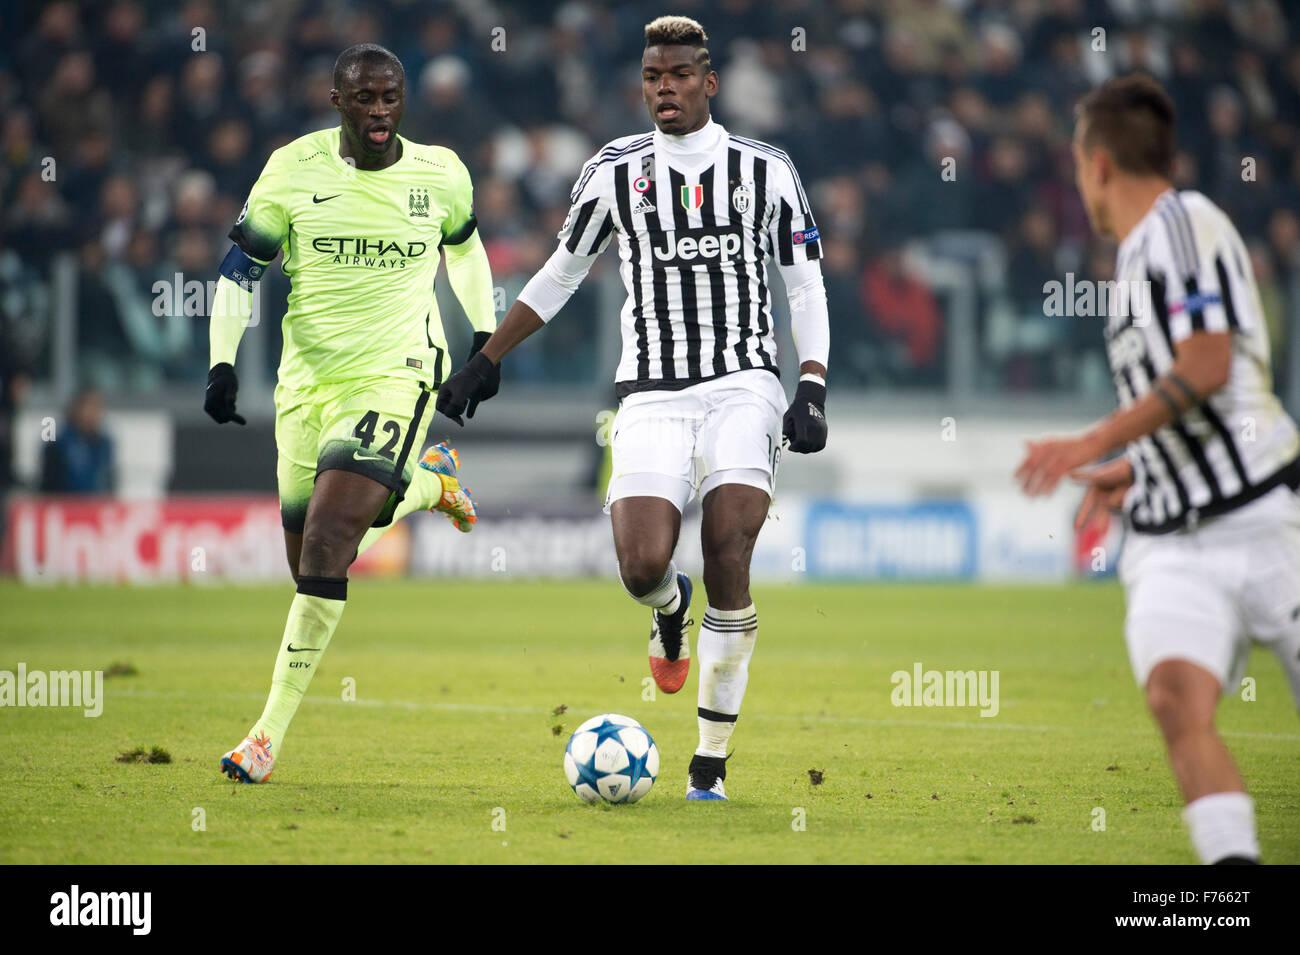 Turin Italy 25th Nov 2015 Yaya Toure Man C Paul Pogba Stock Photo Alamy